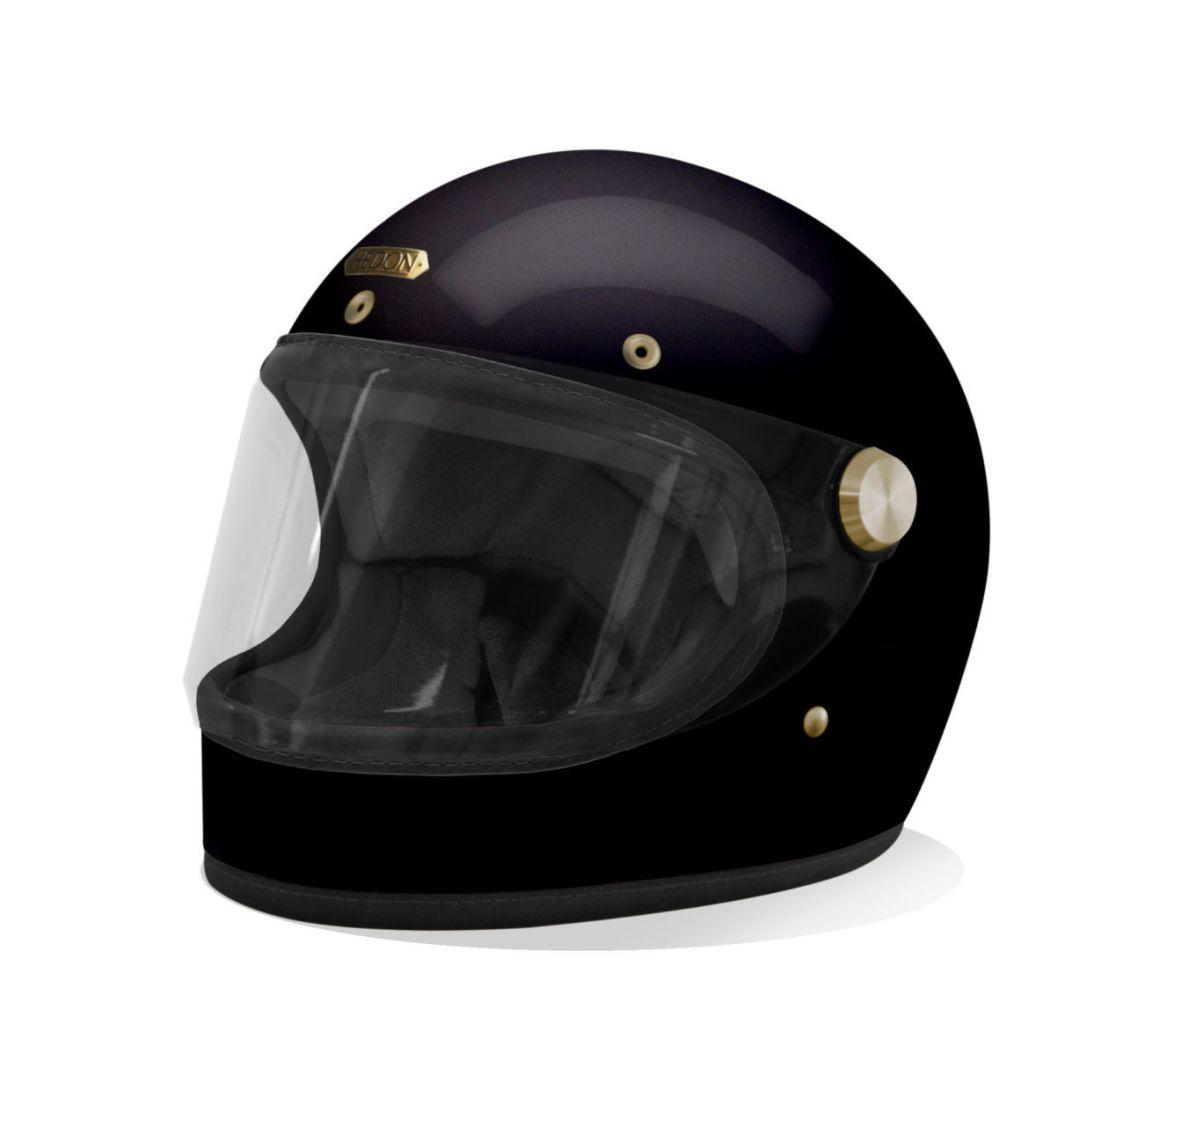 HEDON HEROINE RACER SIGNATURE BLACK   CustomBike.cc